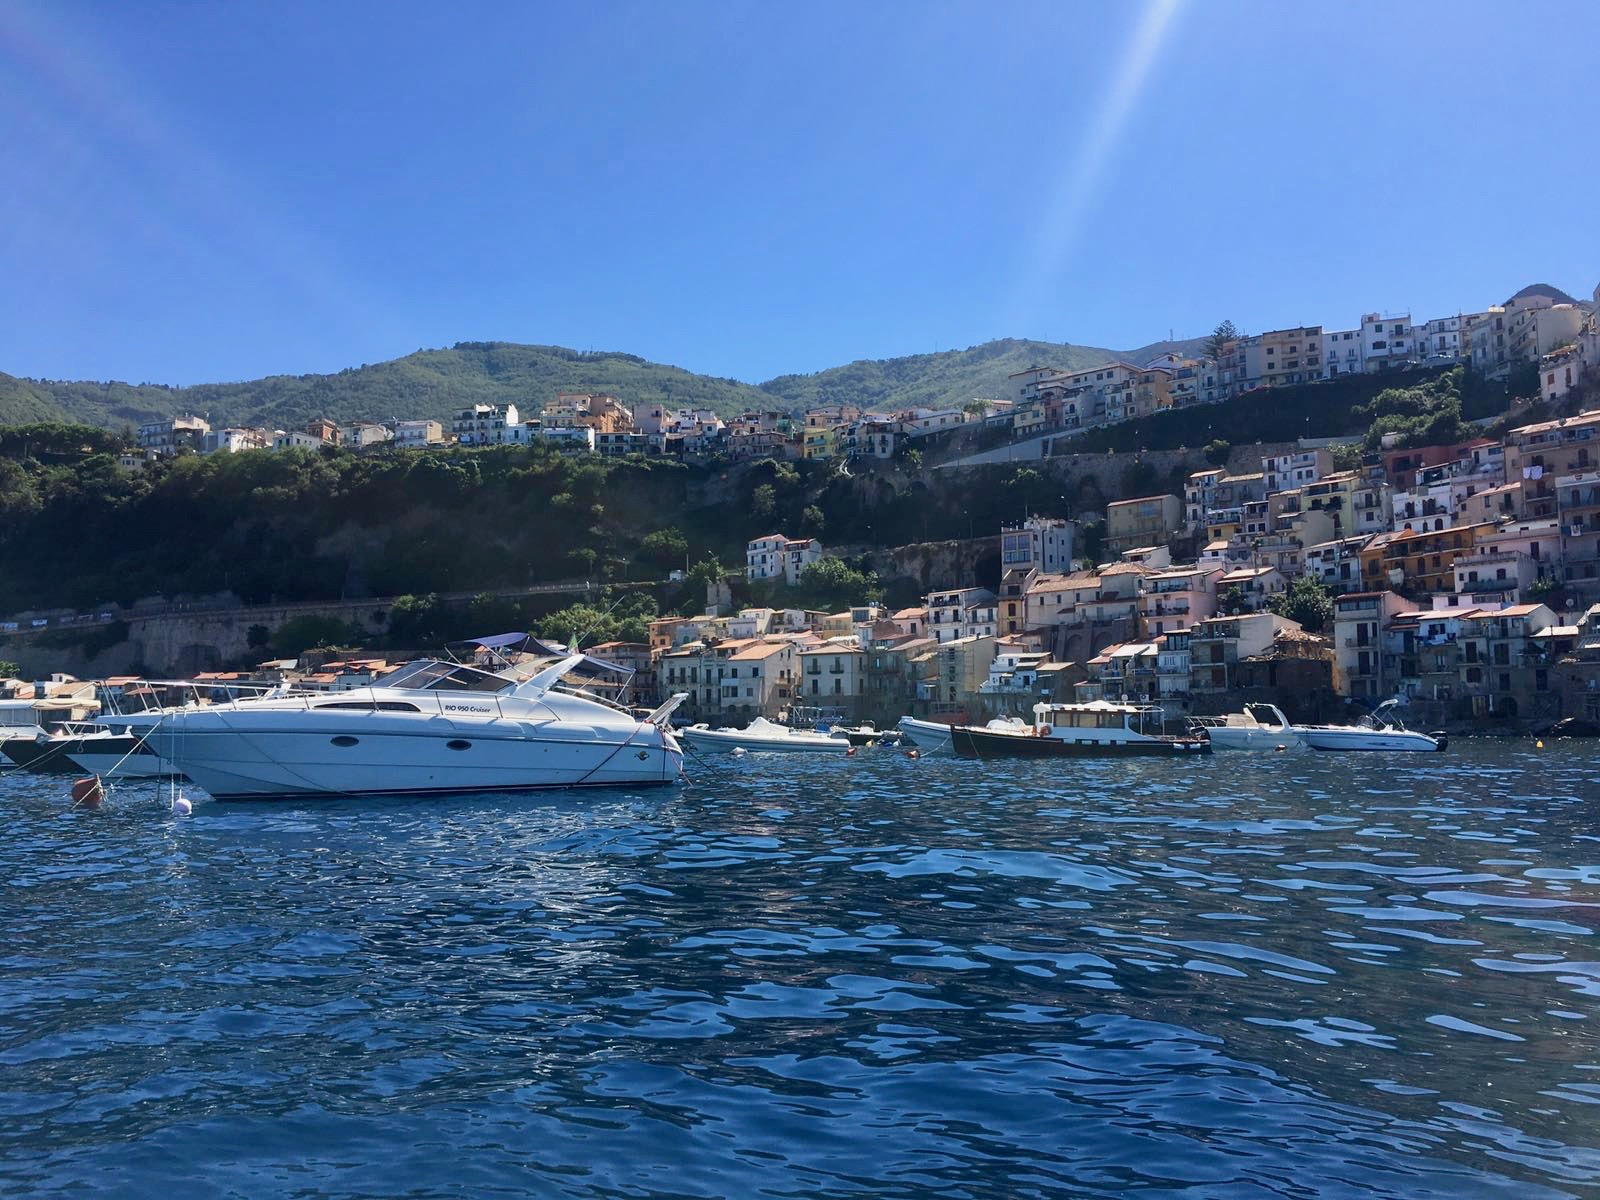 Calabria Yacht Tour